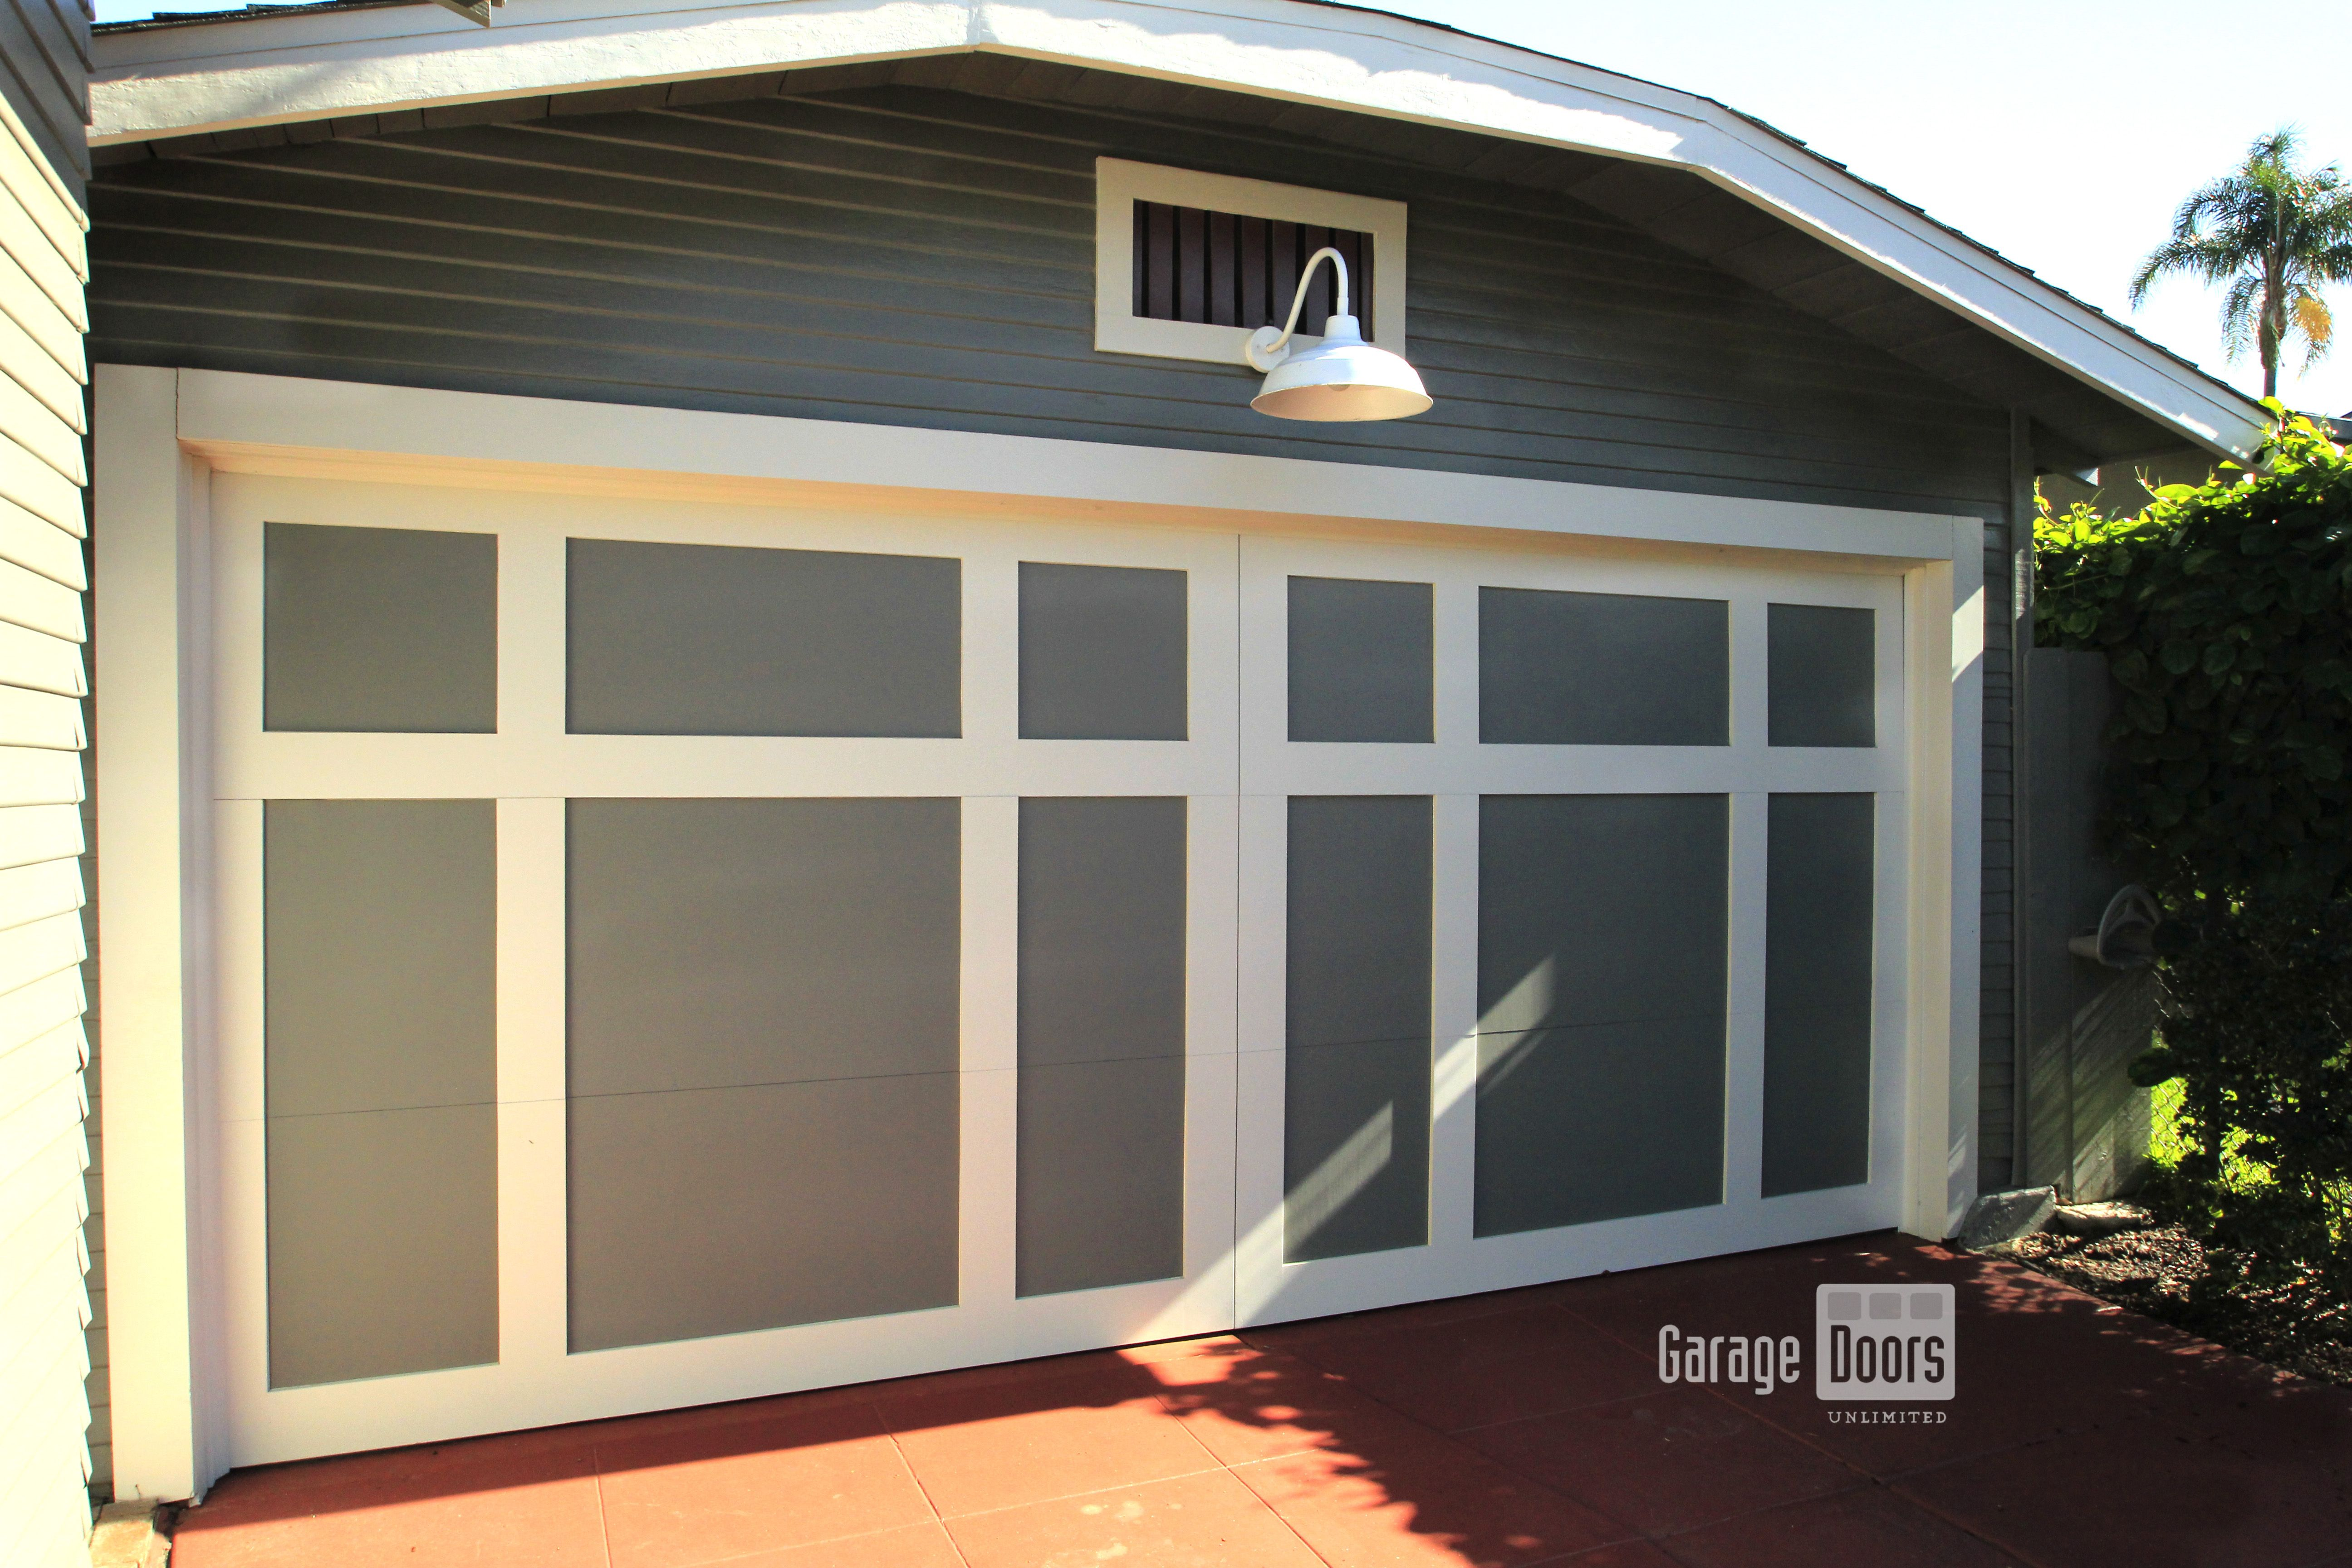 Barn Style Garage Doors With White Trimming San Diego Ca Barn Style Garage Doors Wood Garage Doors Garage Doors